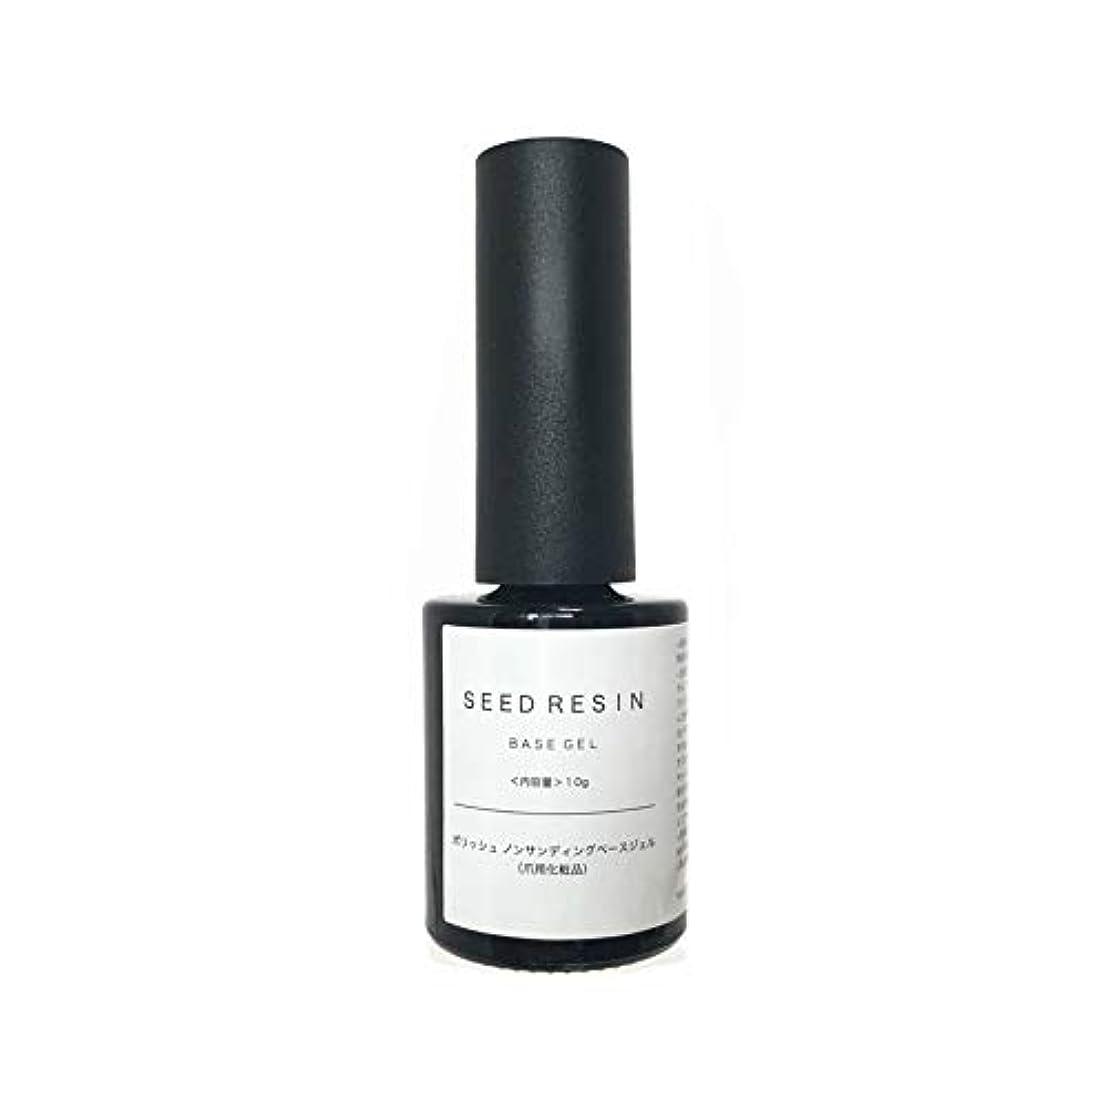 SEED RESIN(シードレジン) ジェルネイル ポリッシュ ノンサンディング ベースジェル 10g 爪用化粧品